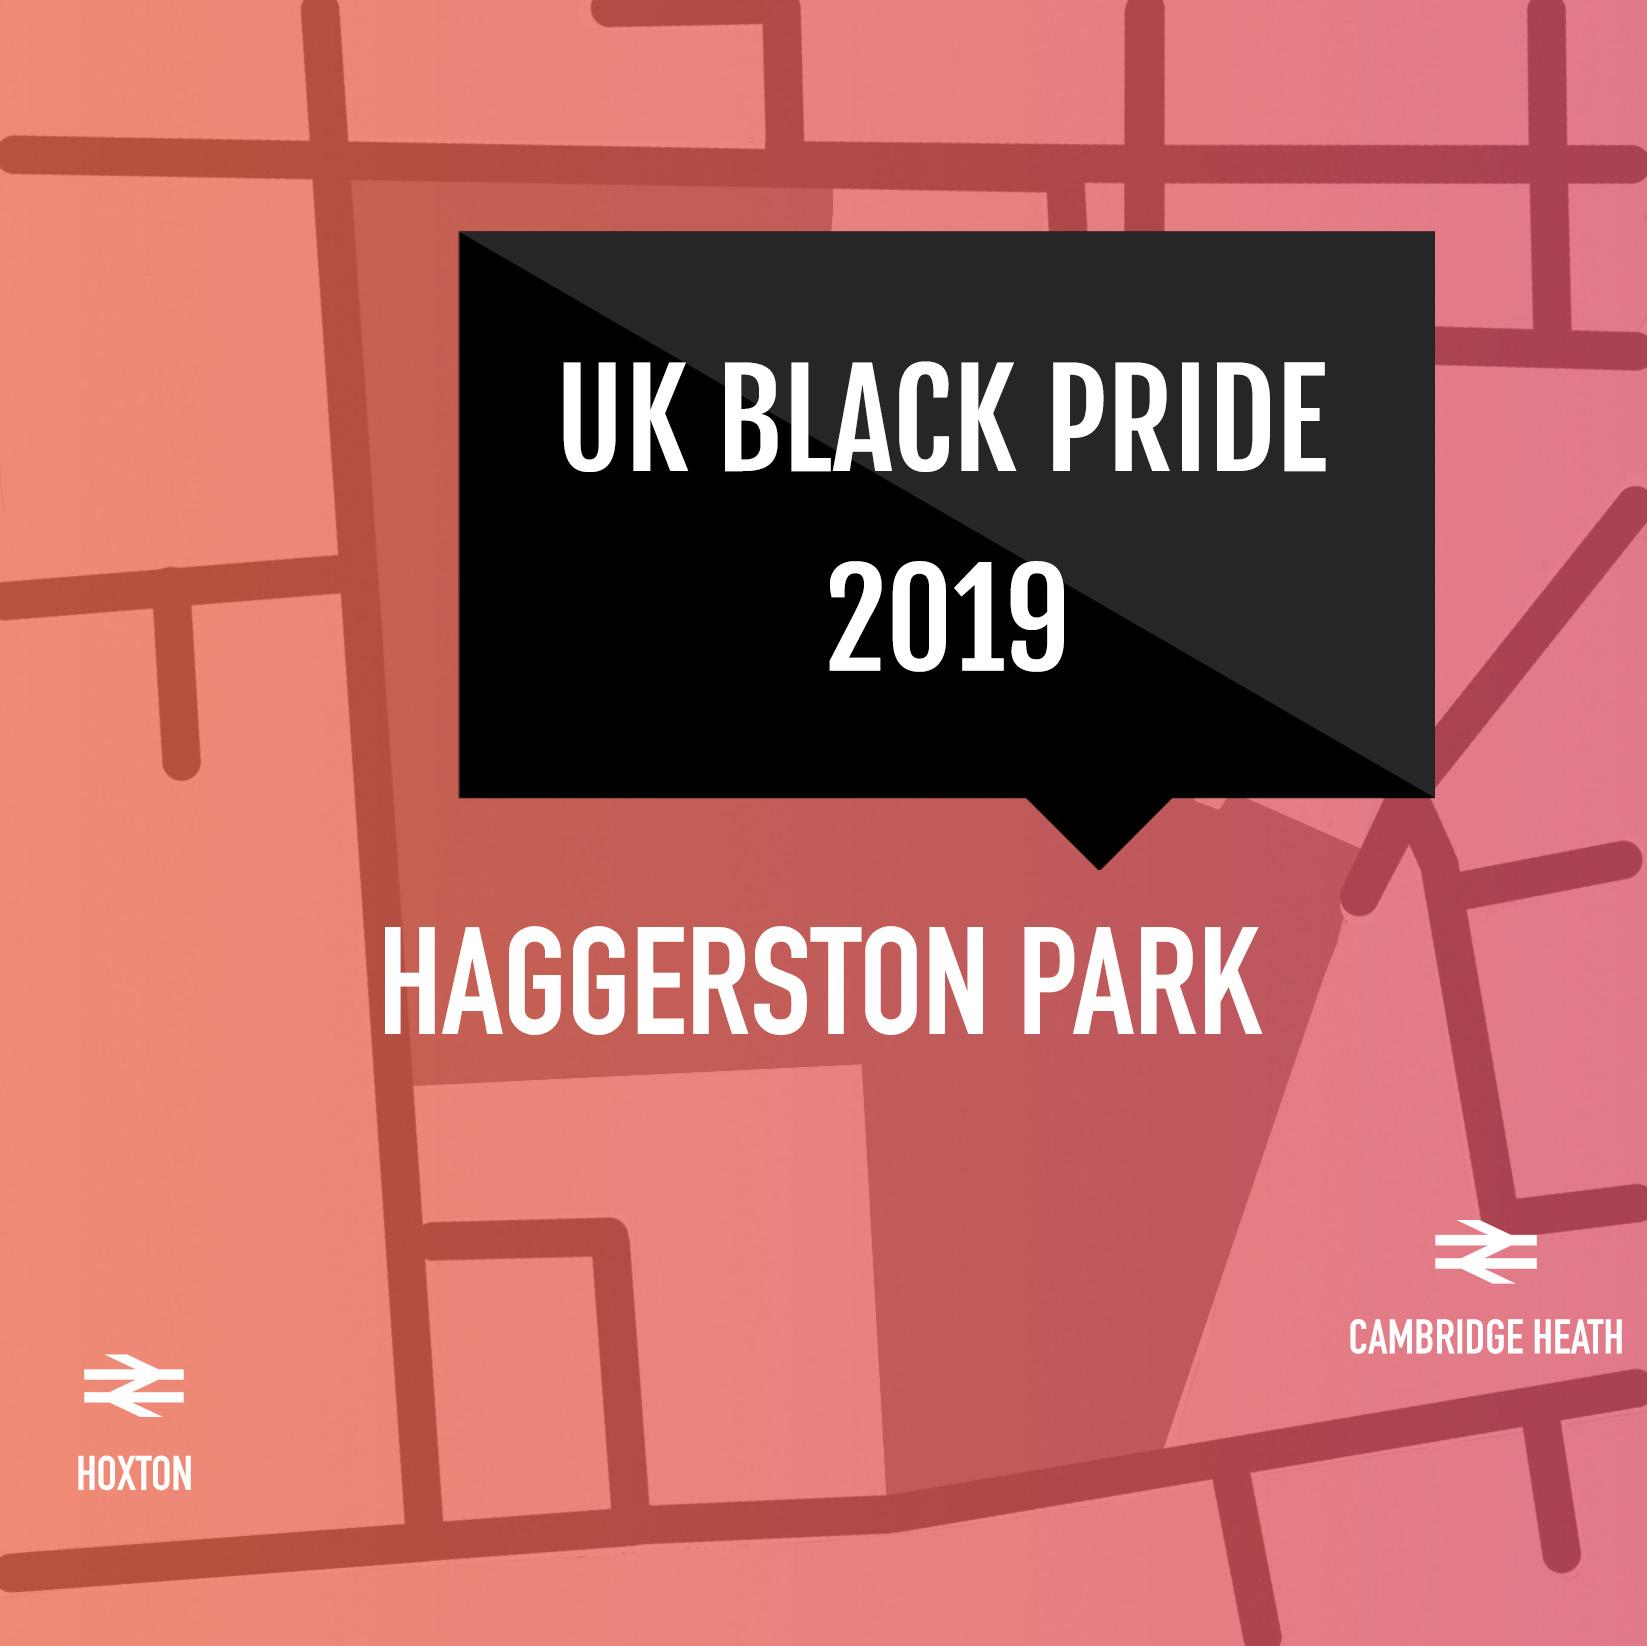 haggerston map copy.jpg